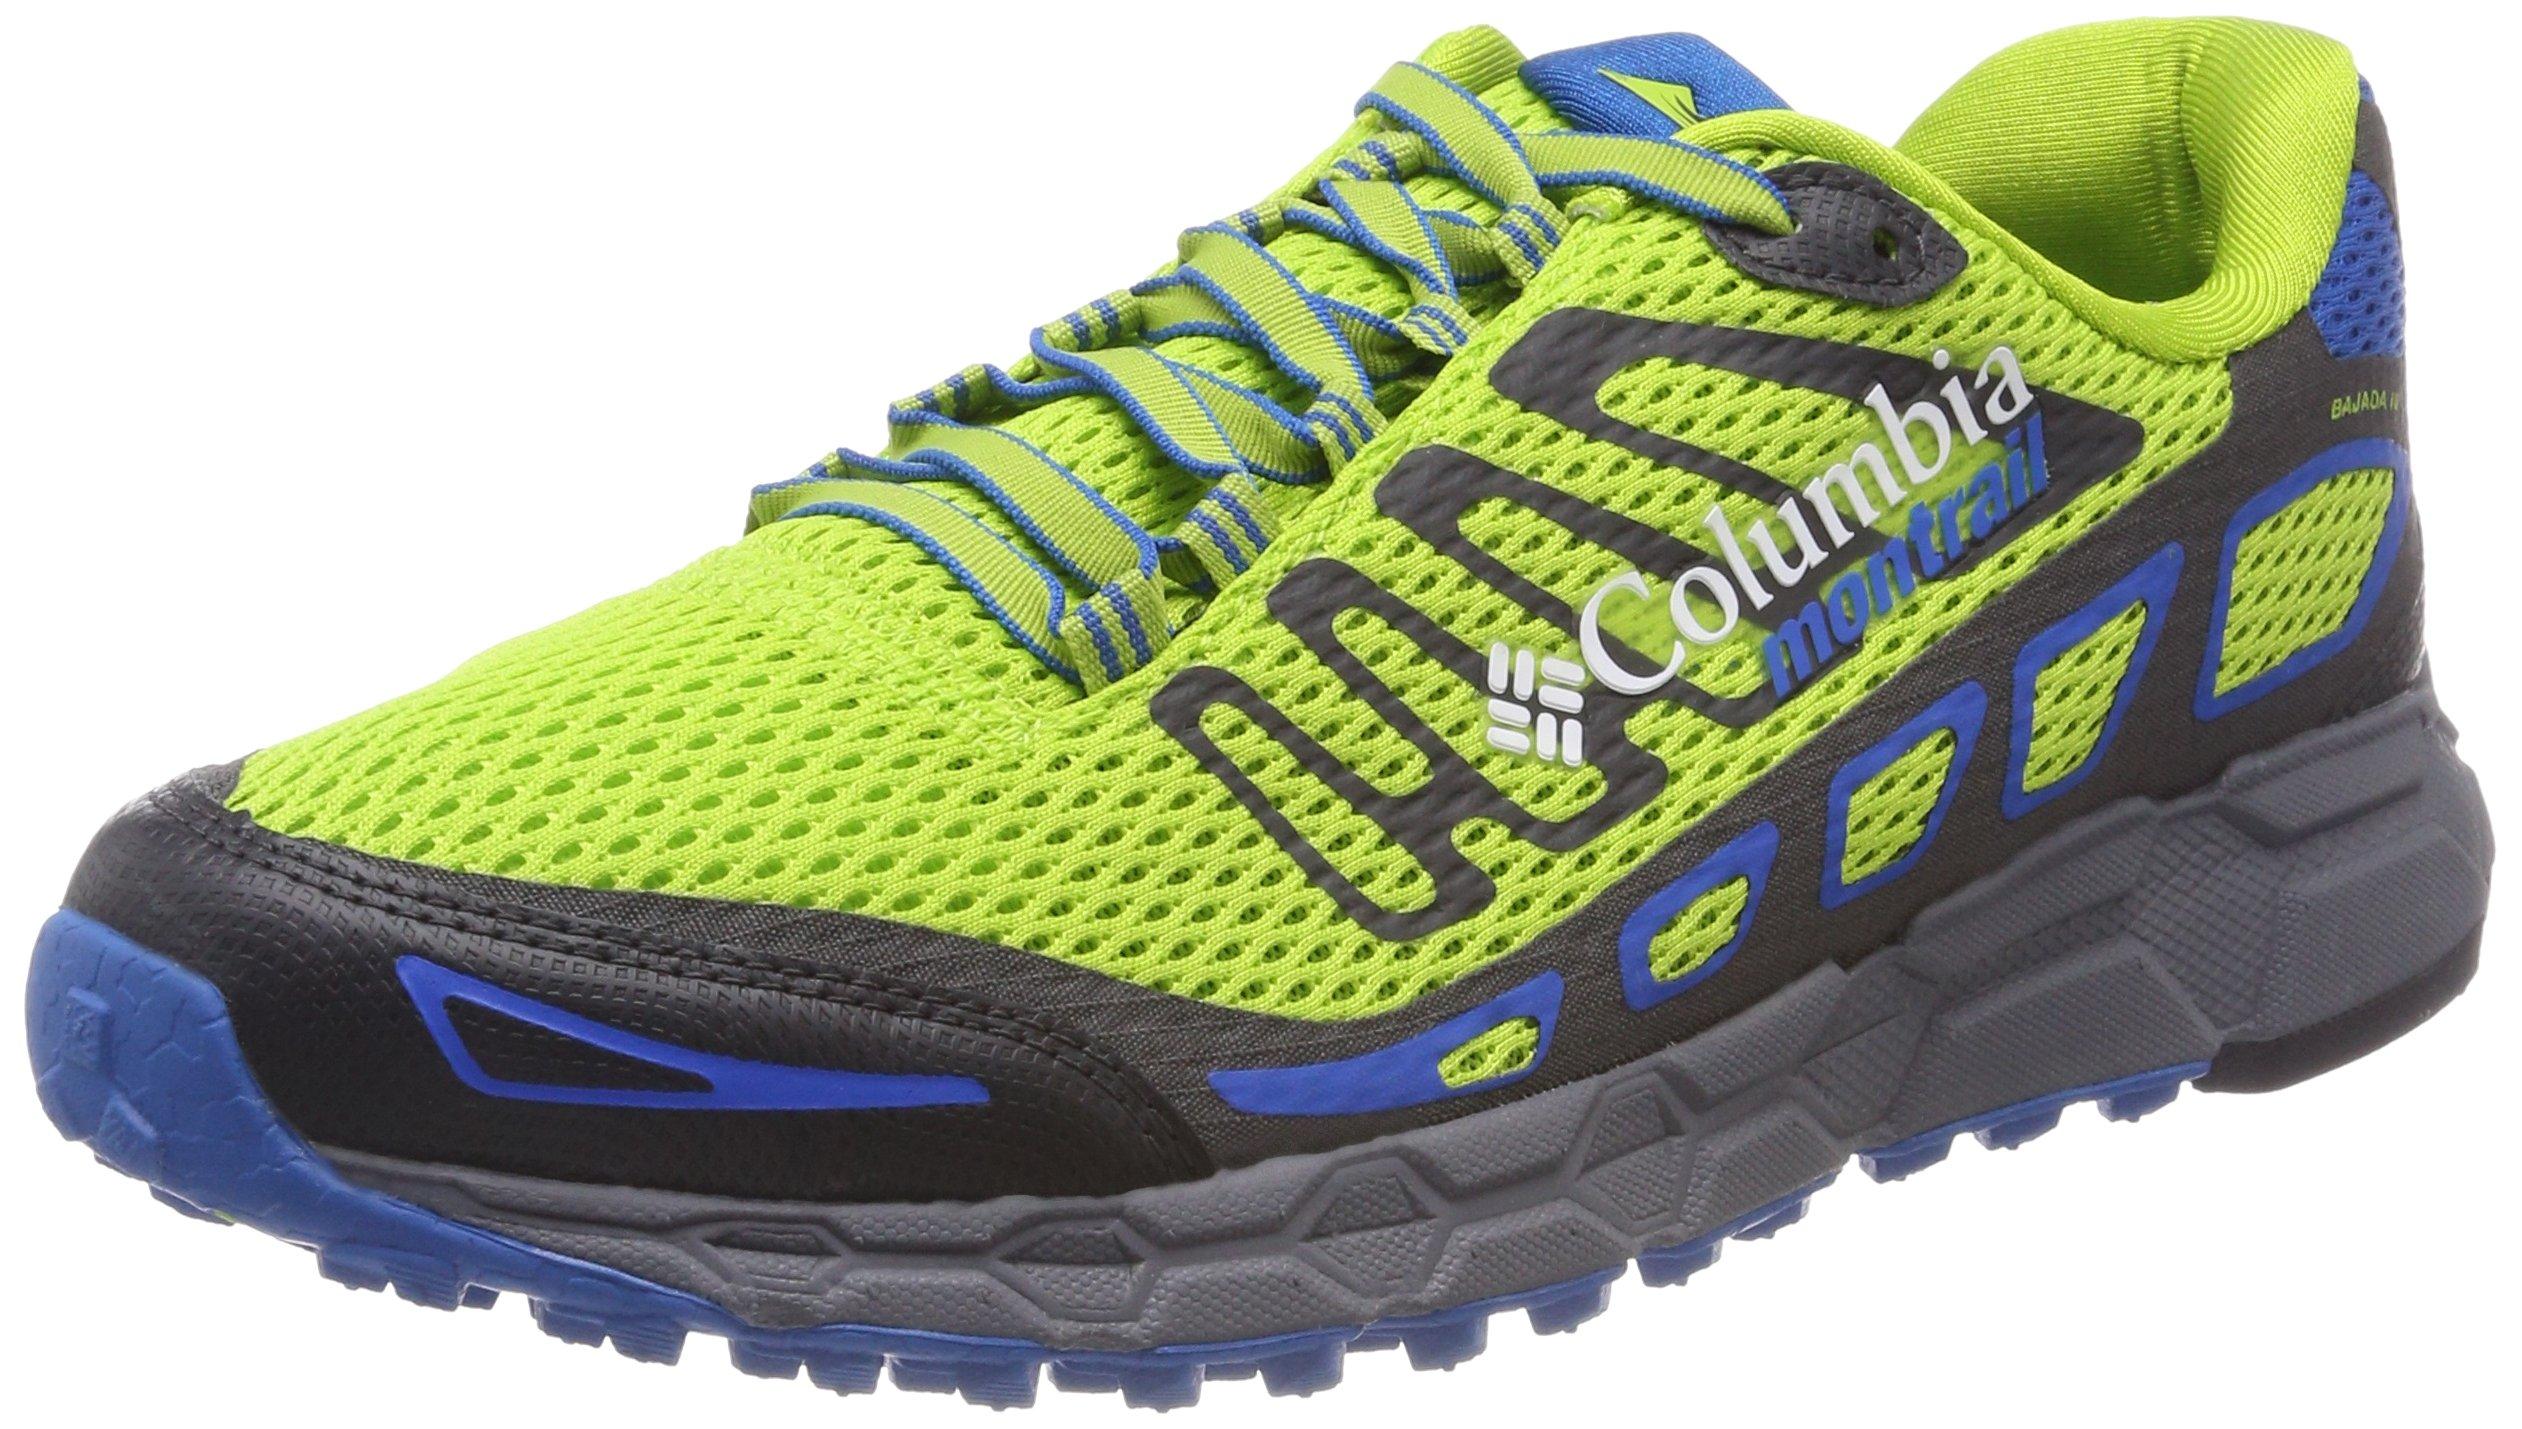 De Trail IiiVertbright GreenMagic RunningBajada BluePointure42 Chaussures Homme Columbia erdCxoB